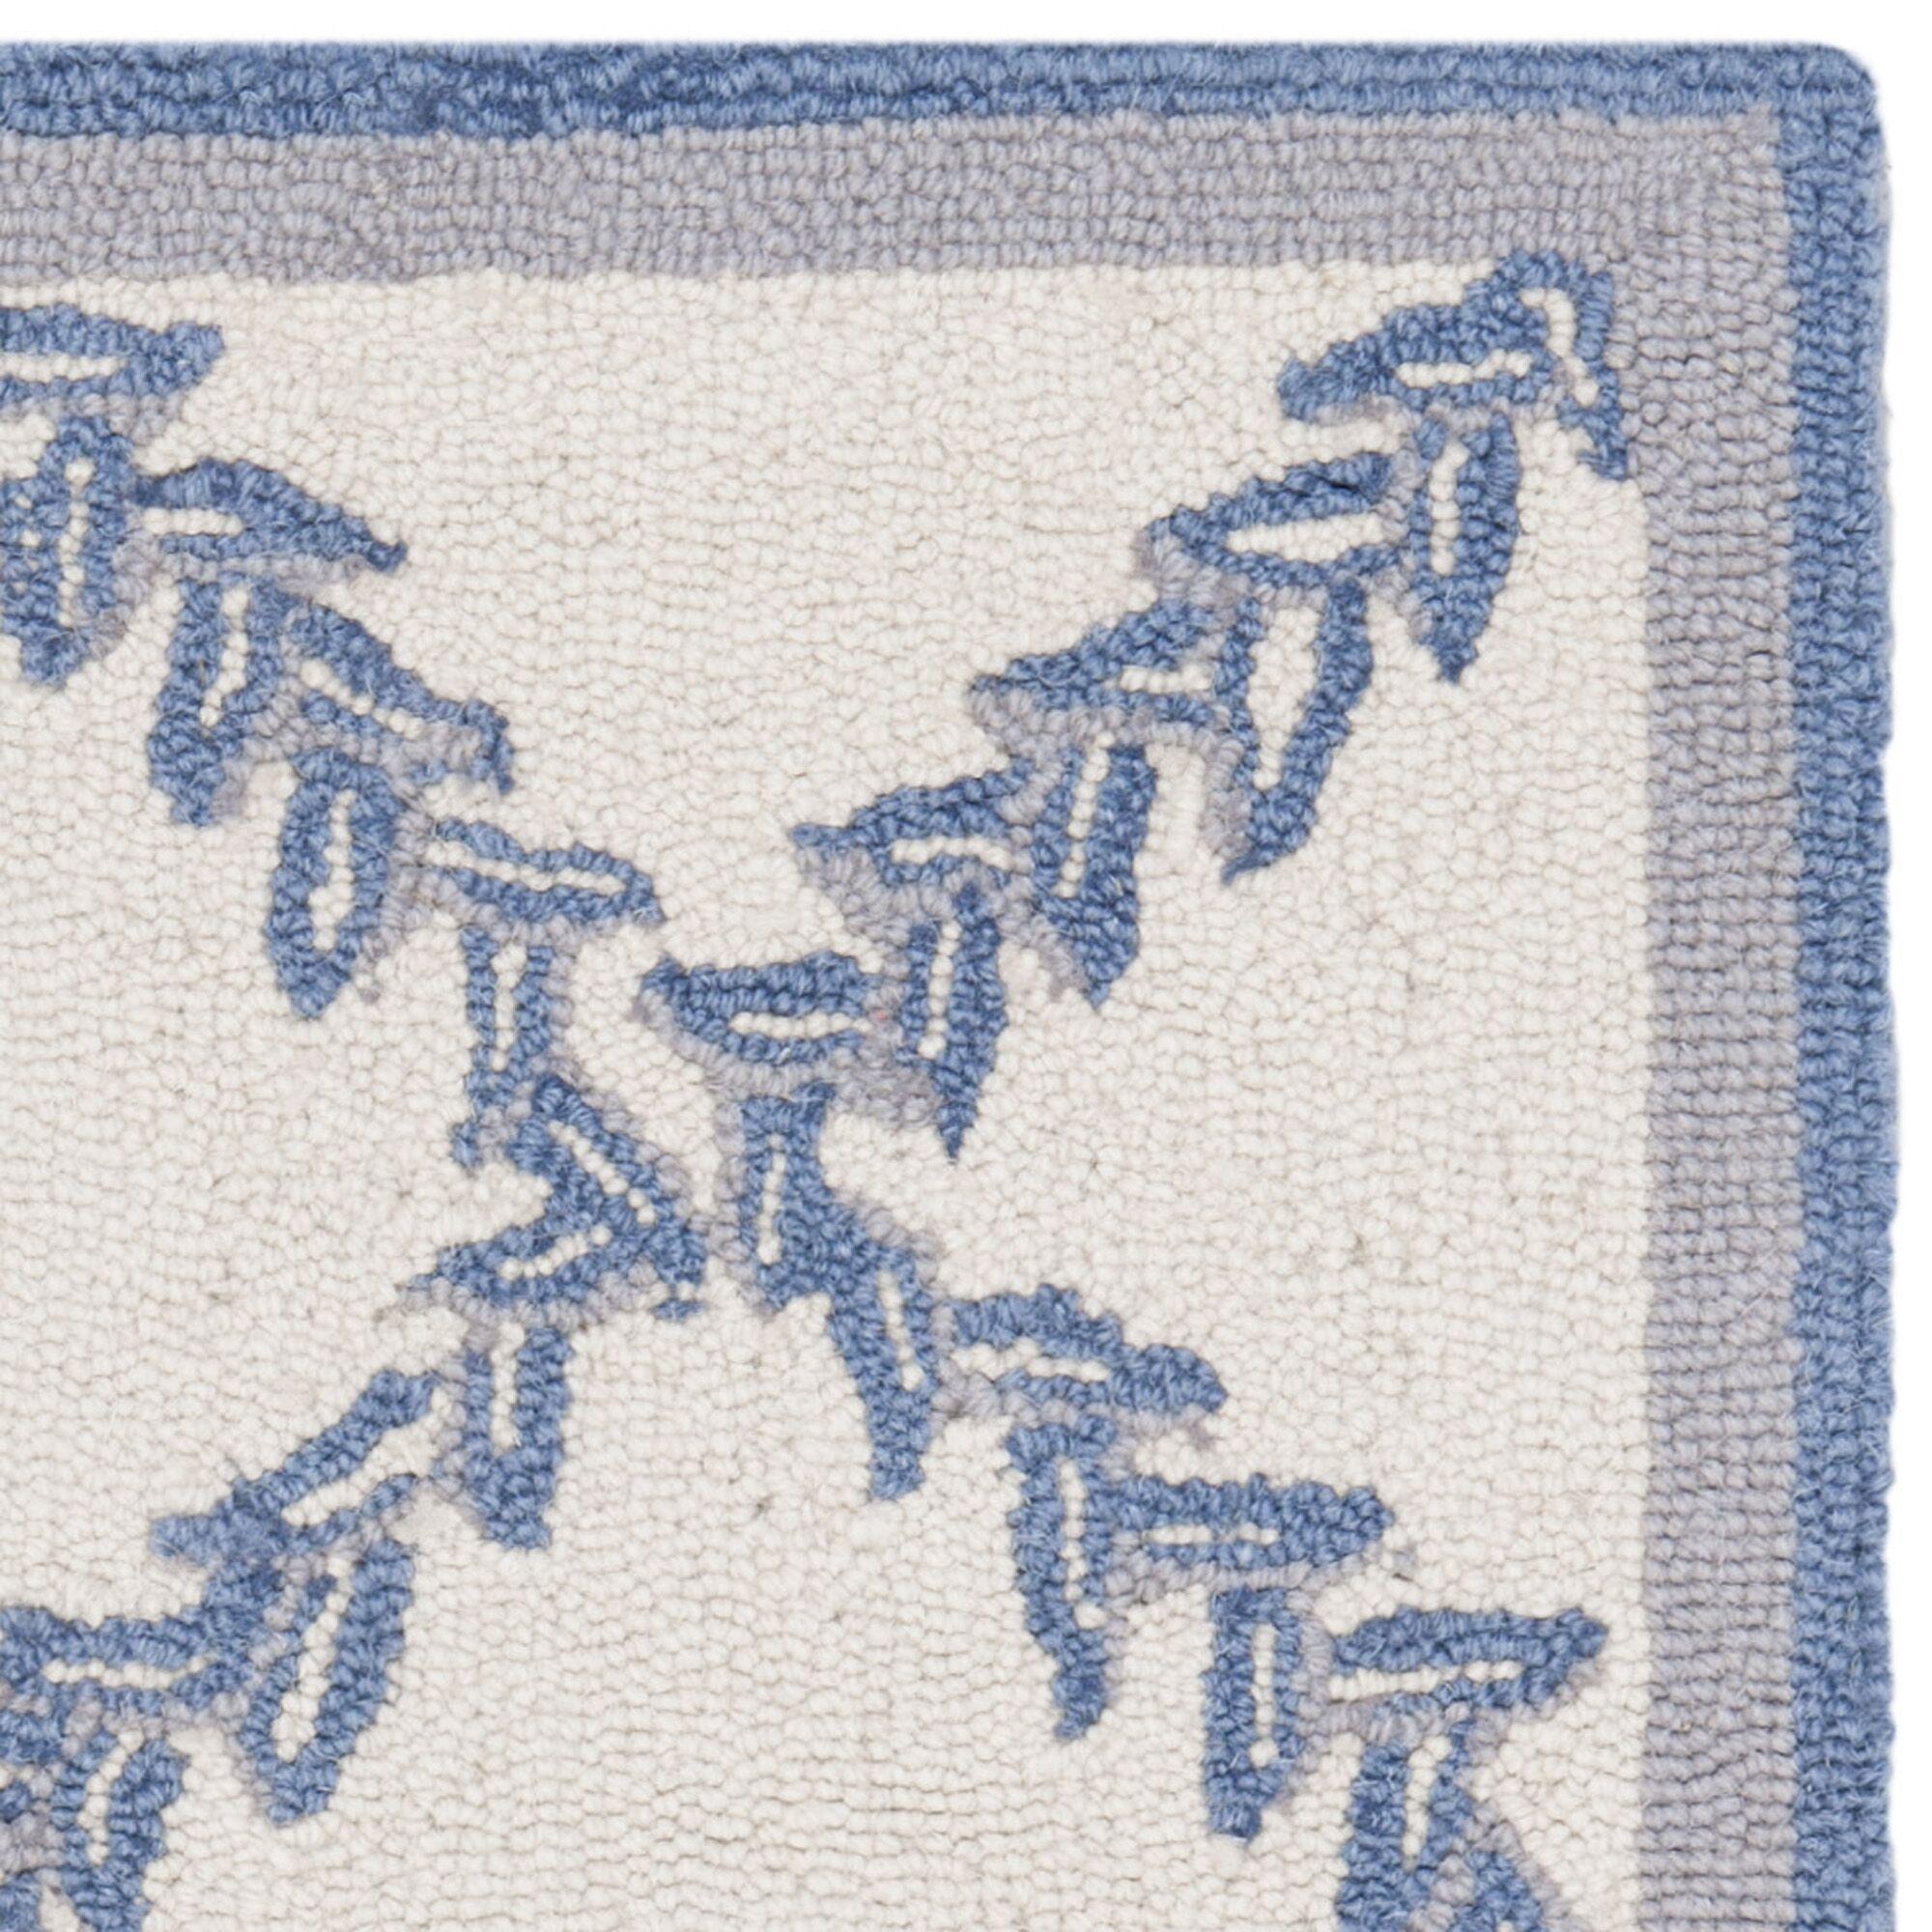 Martin Ivory & Blue Wilton Trellis Area Rug Rug Size: Rectangle 1'8